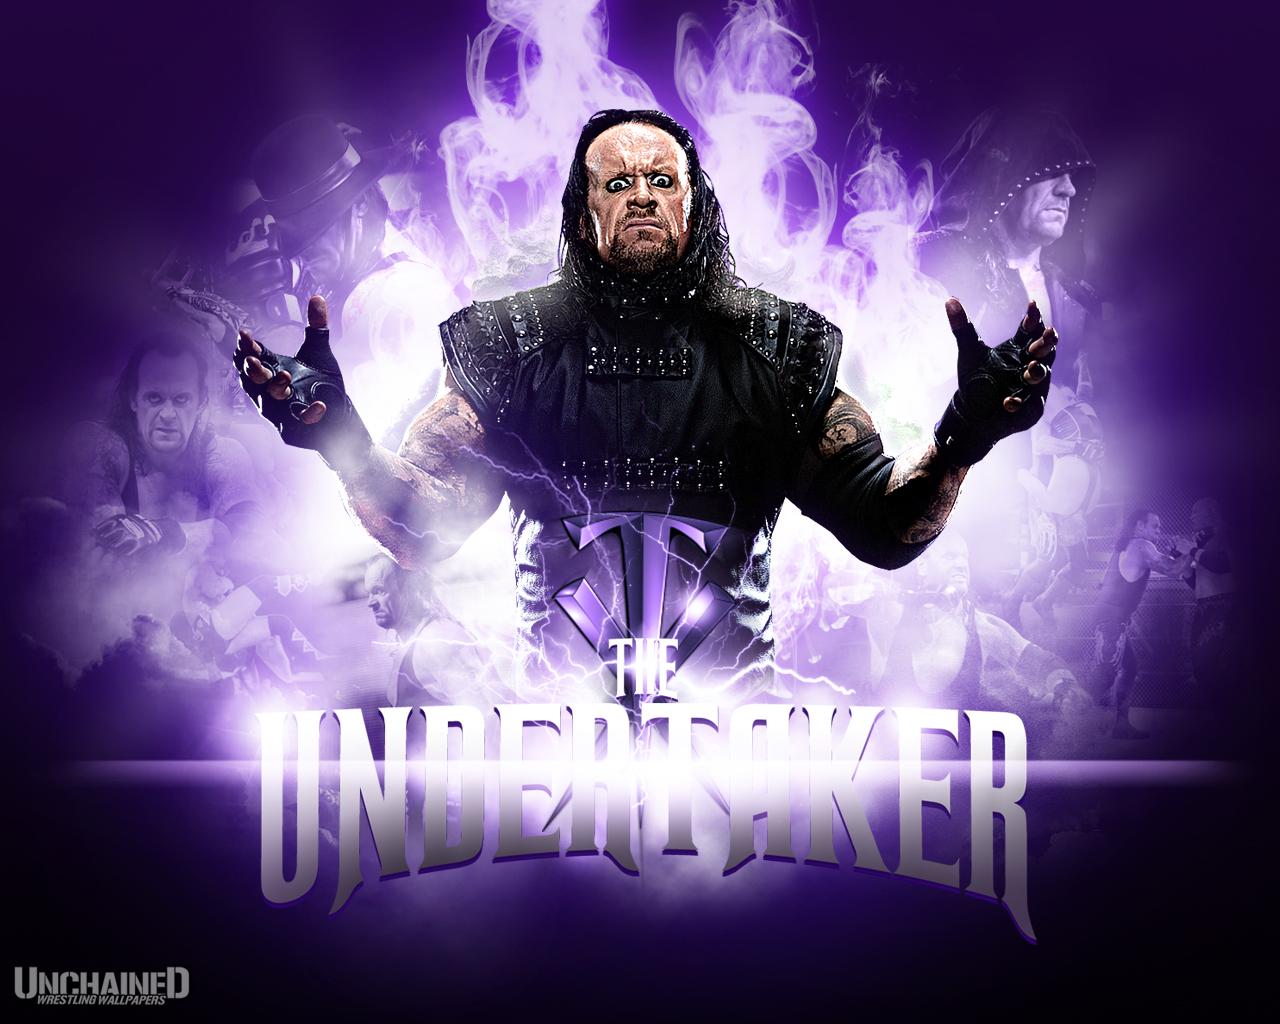 http://2.bp.blogspot.com/-oioAQPA07VQ/T2Gf9TytZkI/AAAAAAAABUo/wCsXVnwYW08/s1600/Undertaker-wallpaper-06+2012.jpg